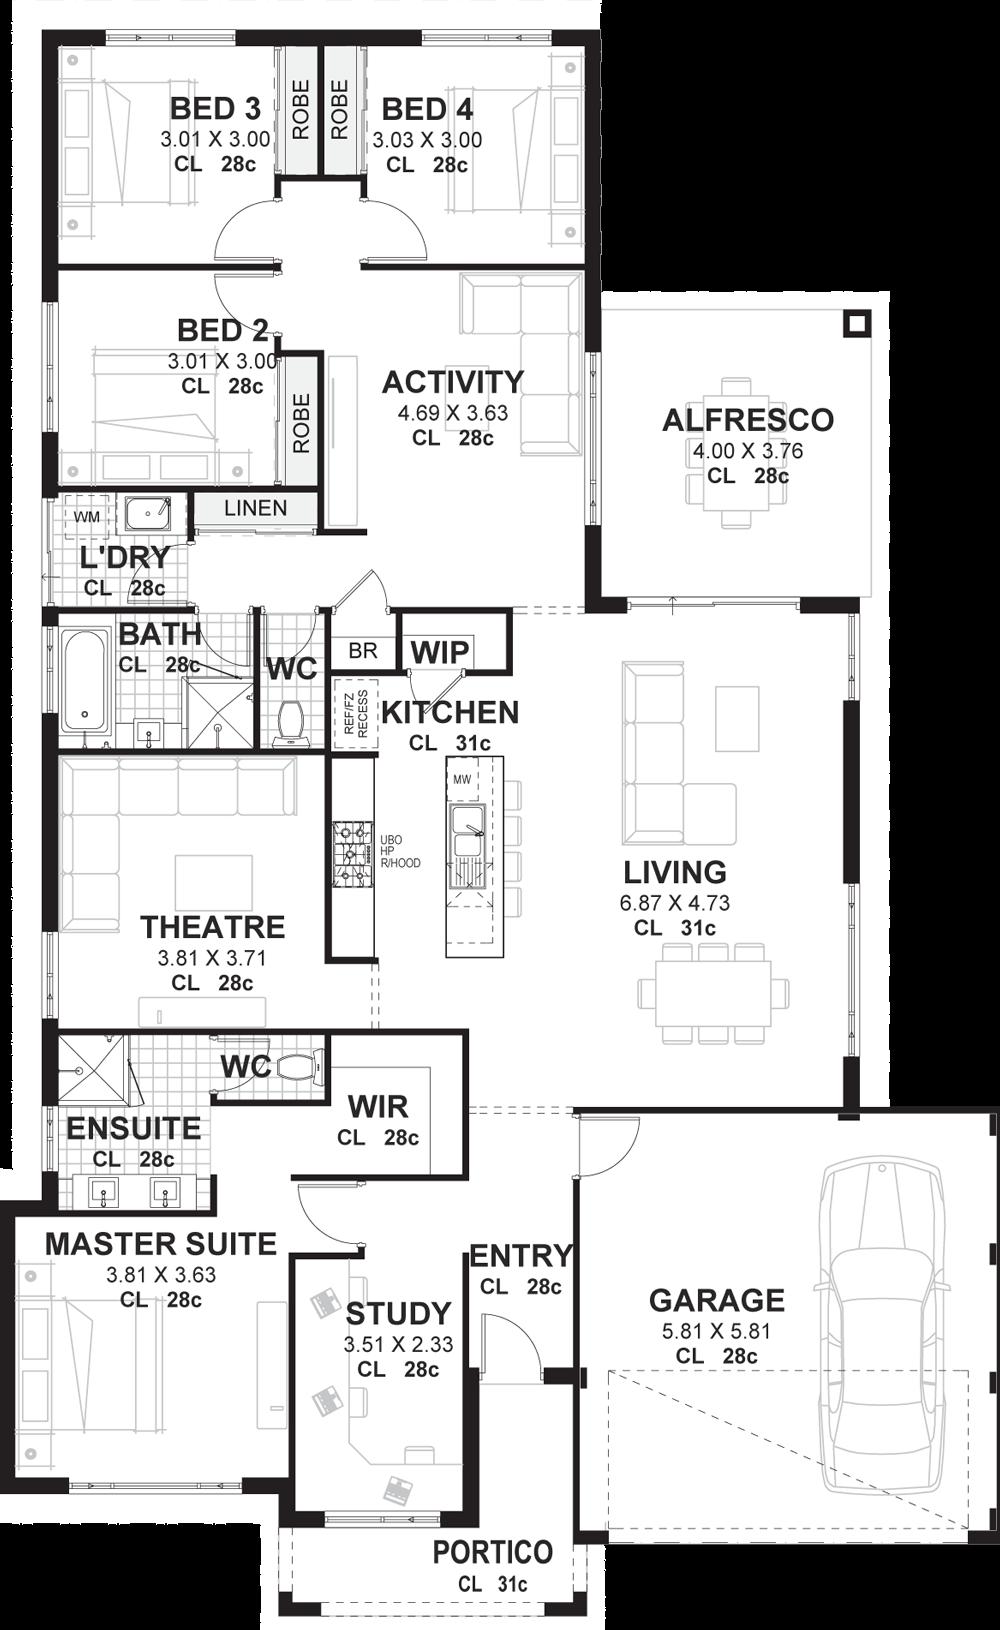 9.SIMPHOME.COM 4 bedroom house plans home designs perth vision one homes.jpg